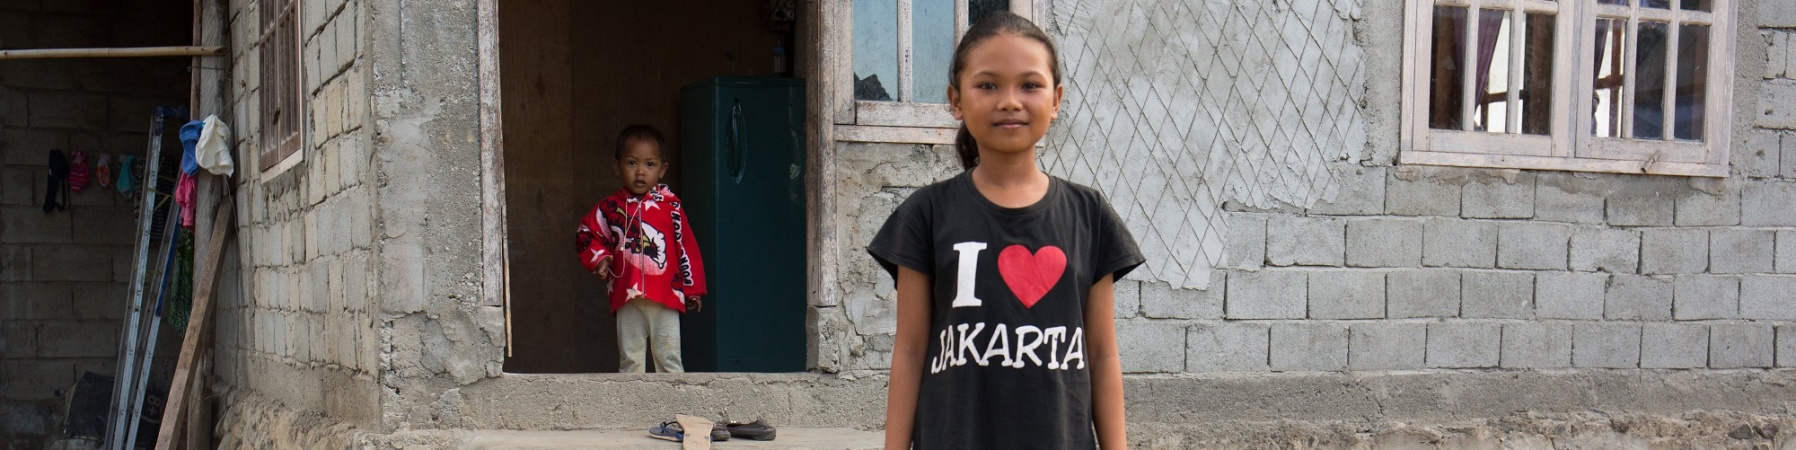 Indonesia educazione a rischio